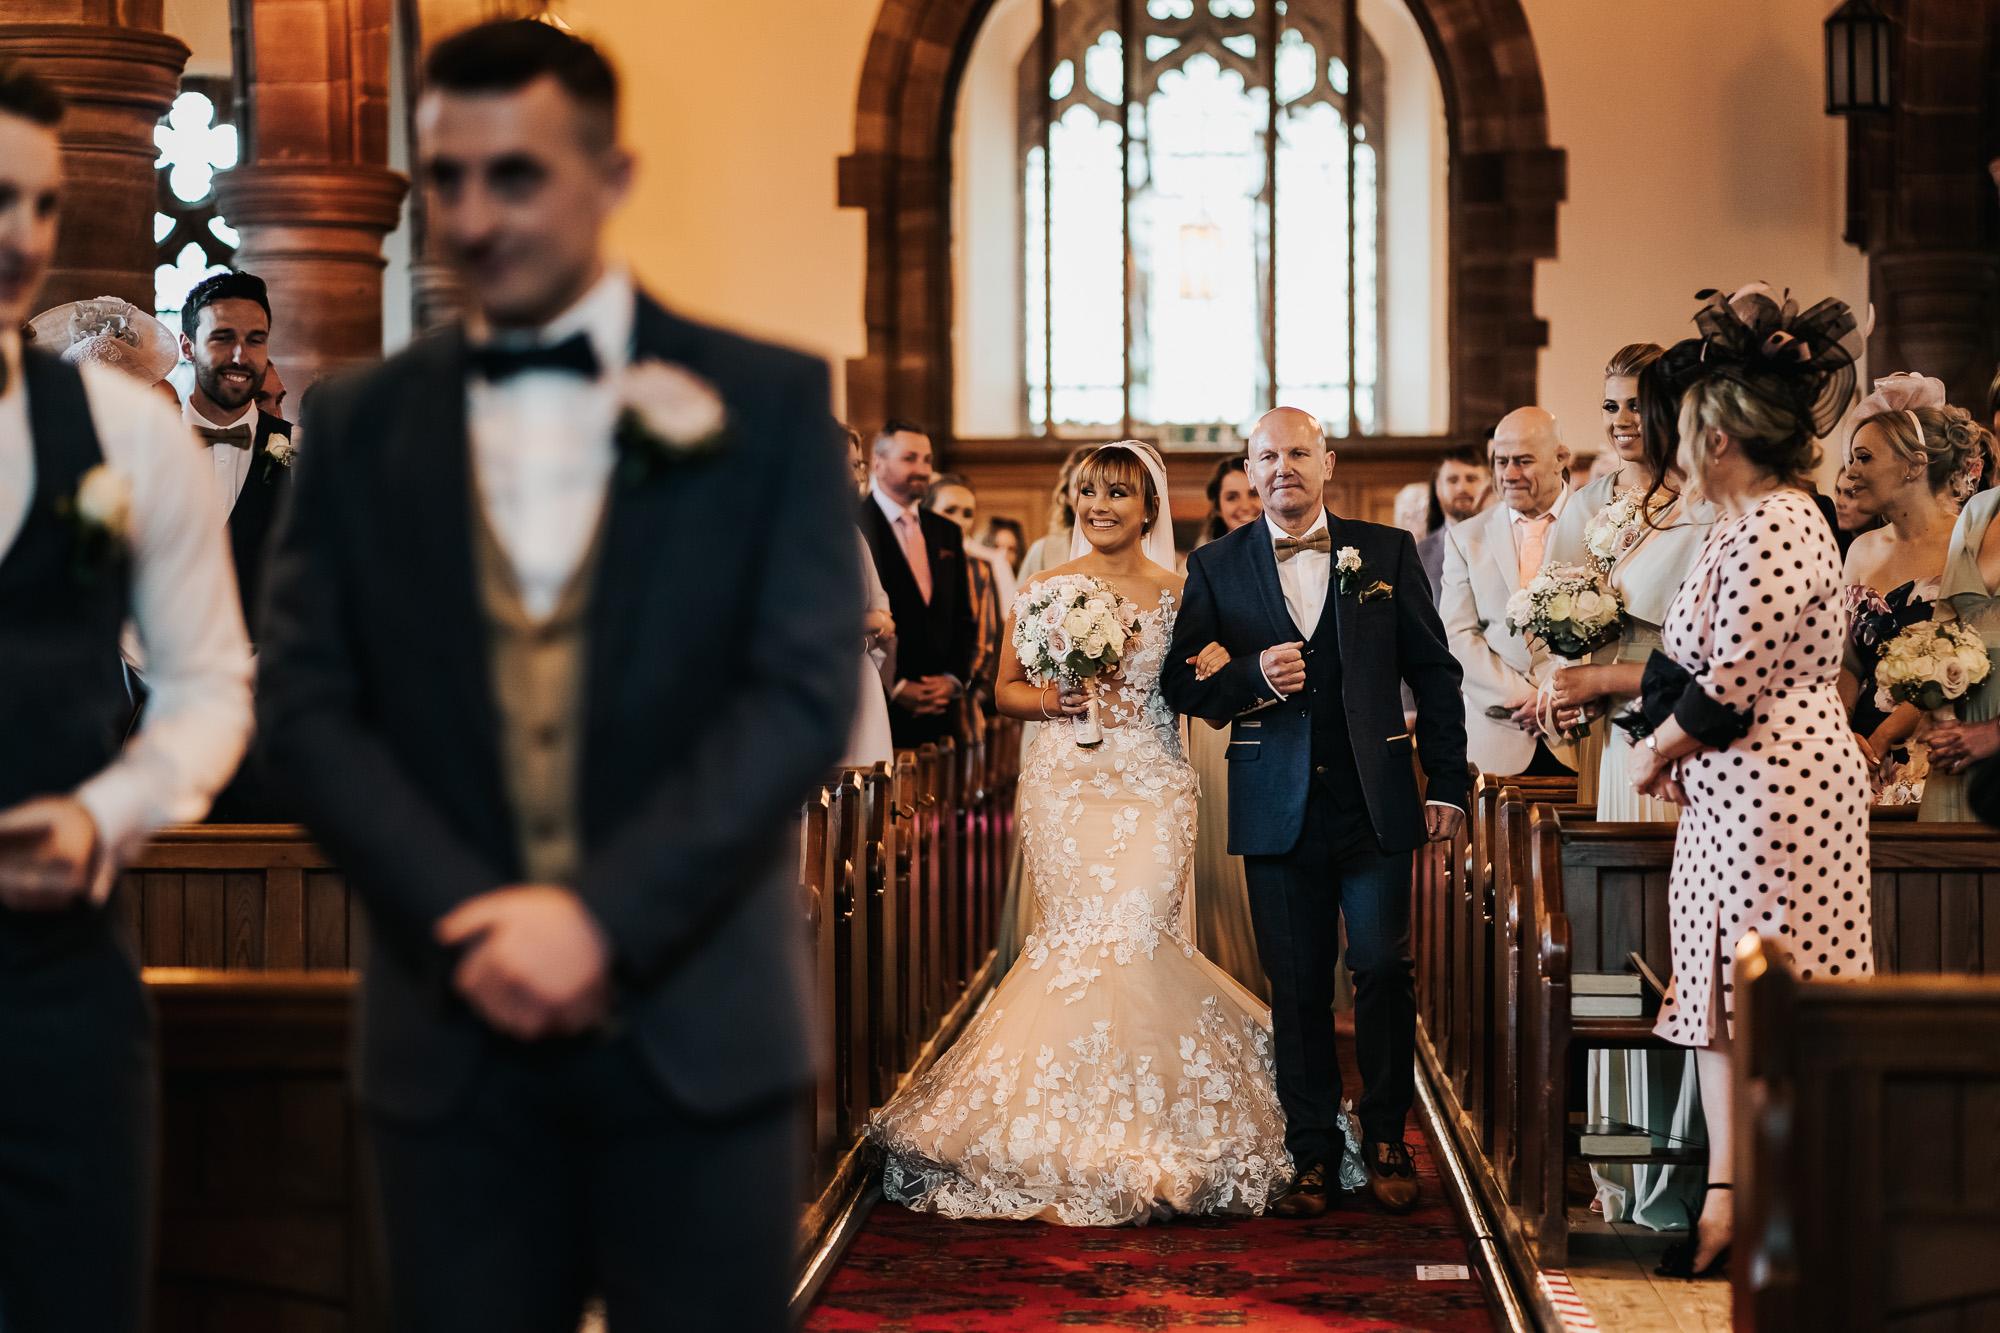 Rivington Hall Barn Wedding PHotographer lancashire wedding photography (13 of 34).jpg